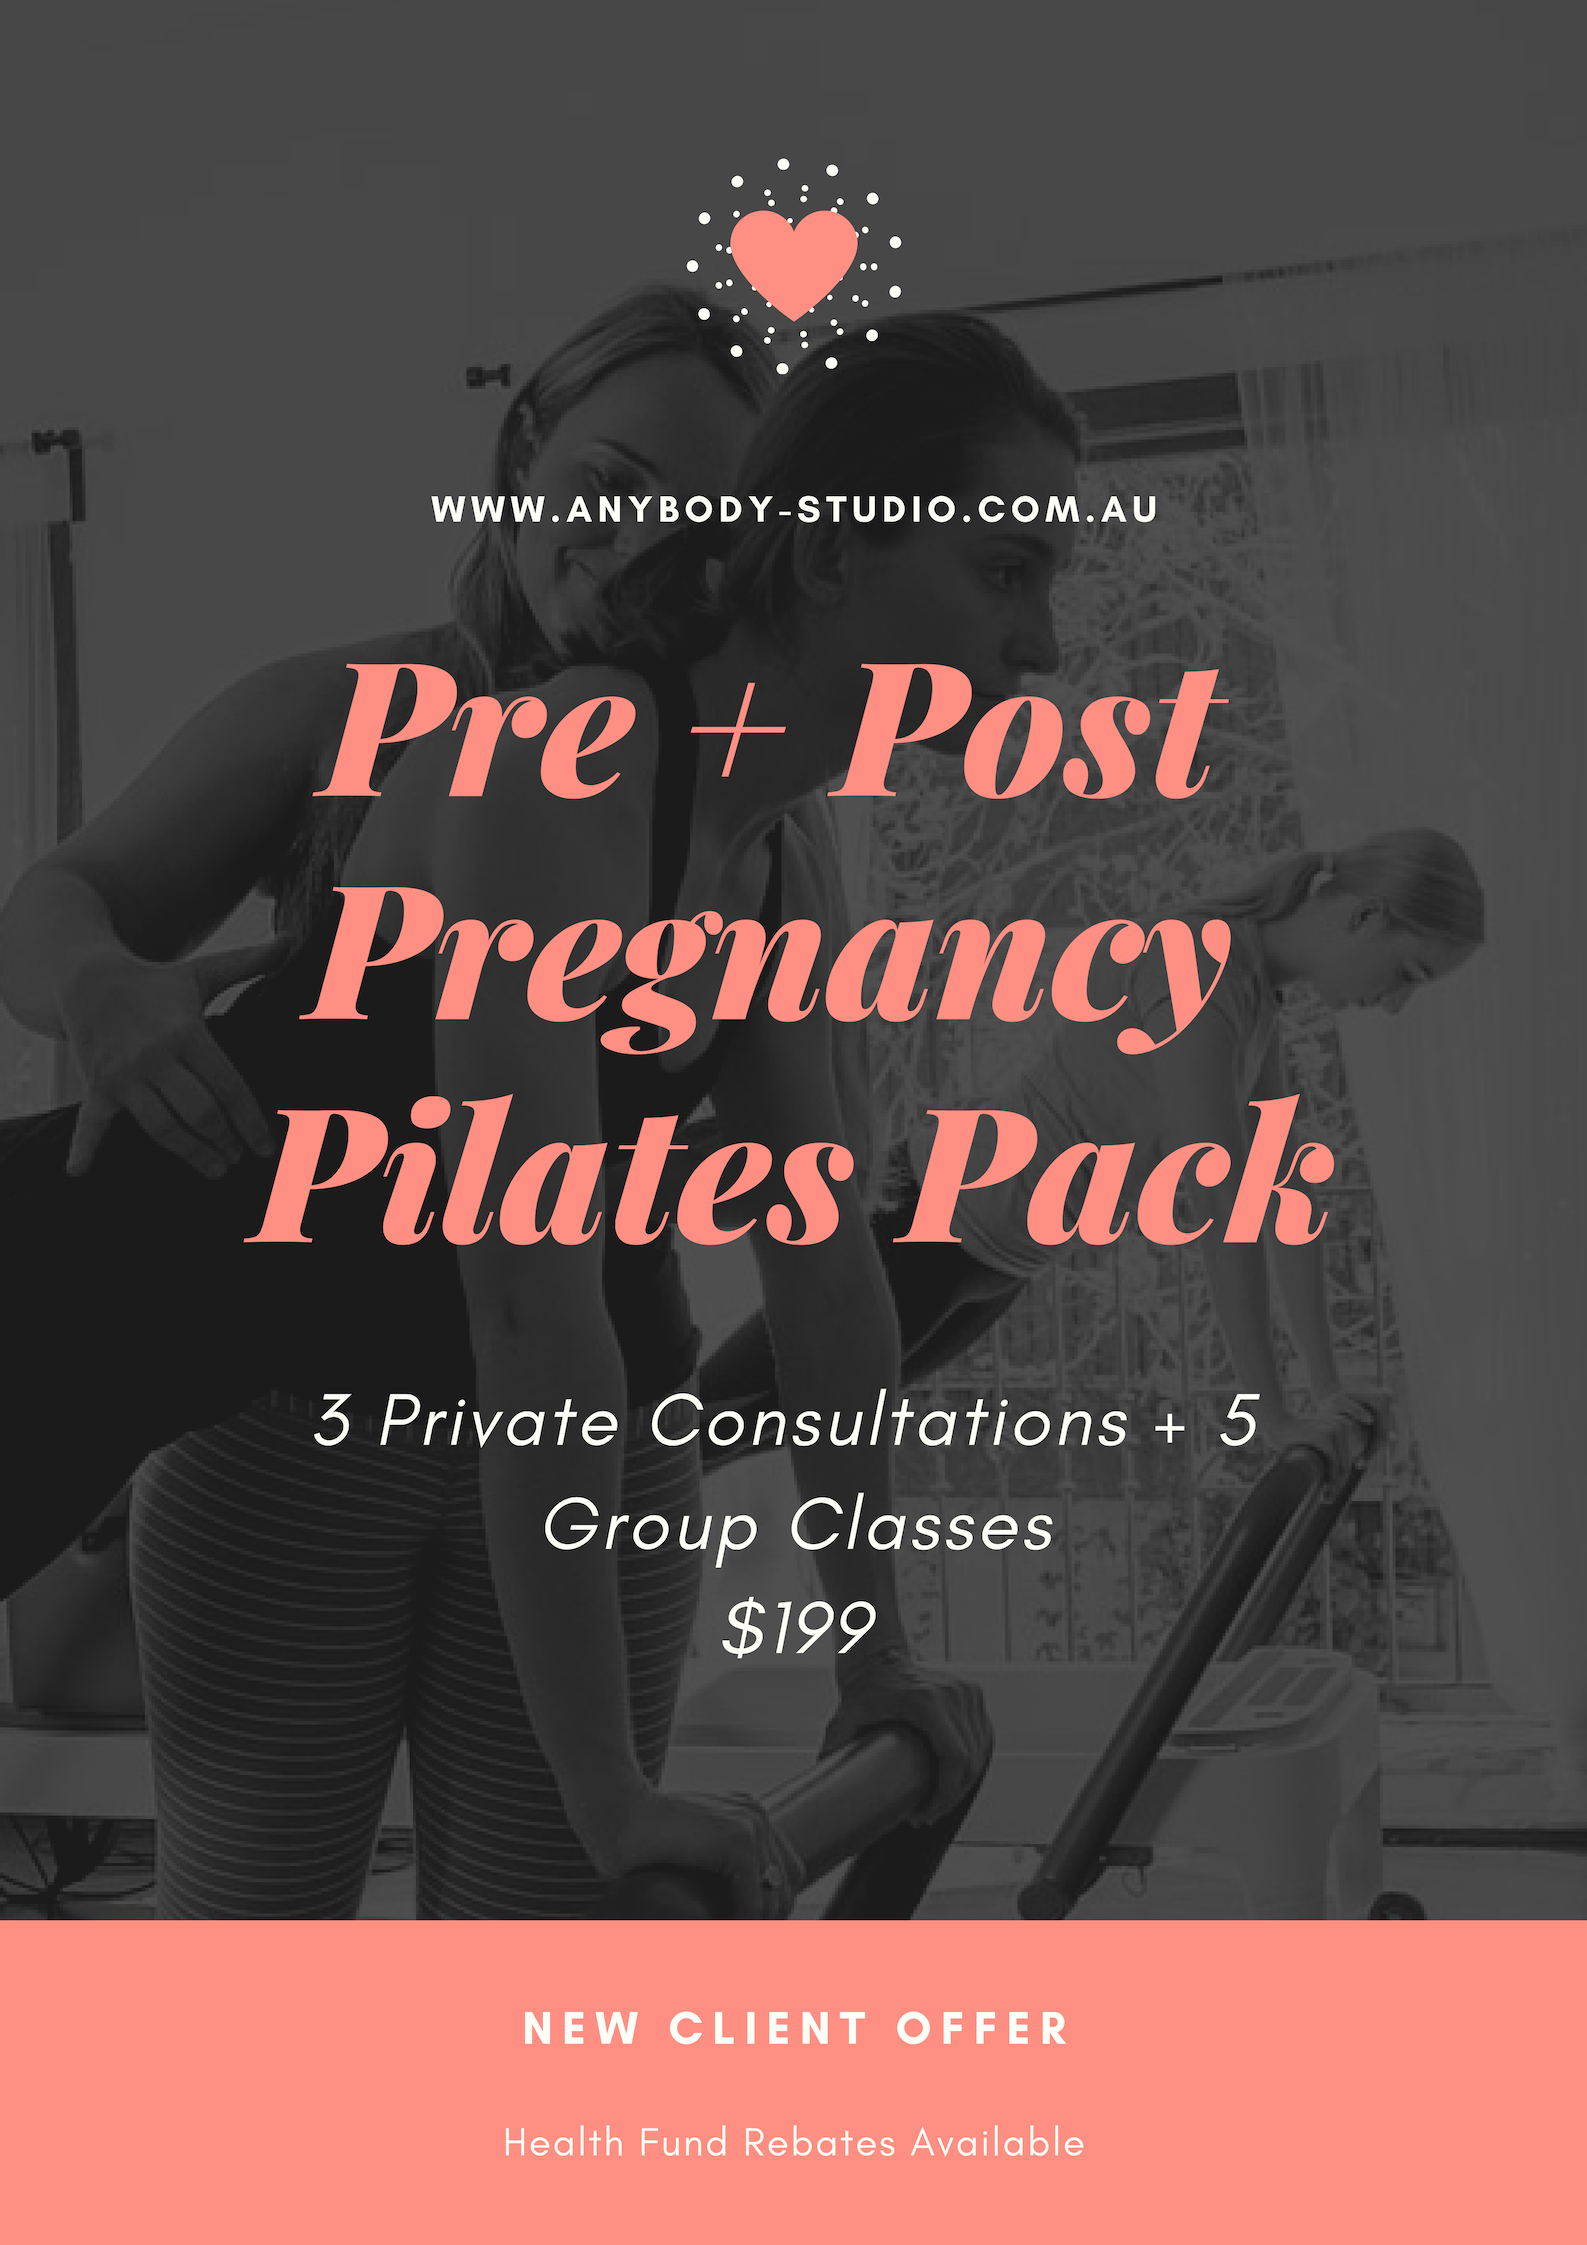 Pre + Post Pregnancy Pilates Pack.jpg